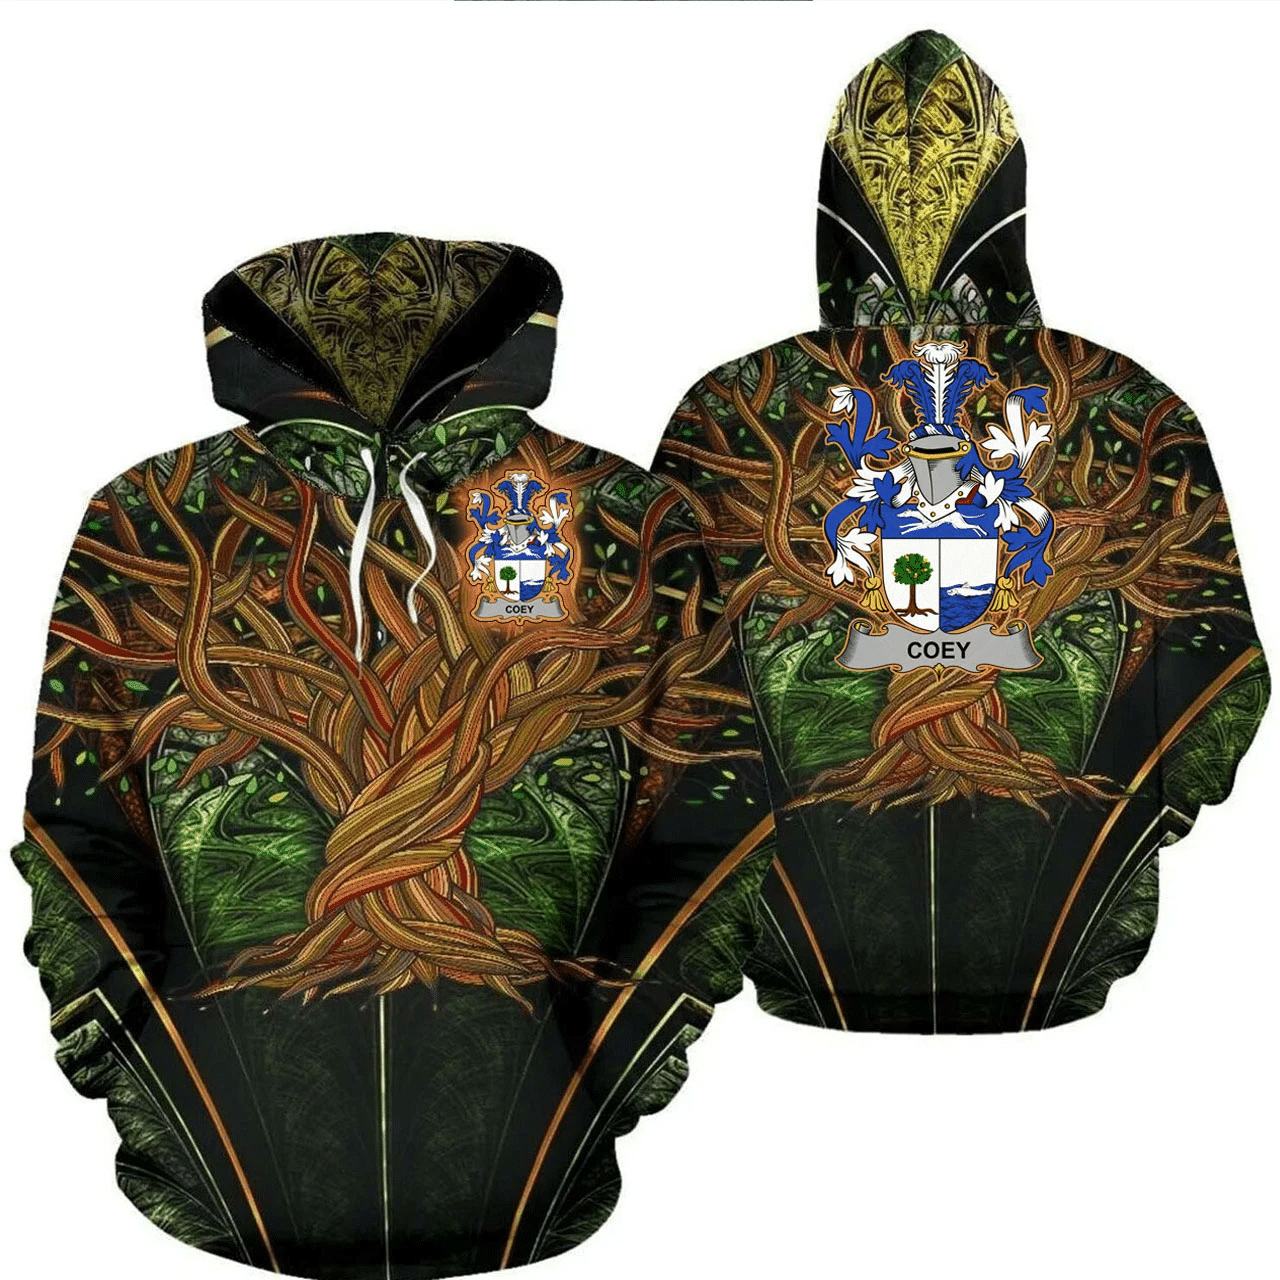 1stIreland Ireland Hoodie - Coey or McCoey Irish Family Crest Hoodie - Tree Of Life A7